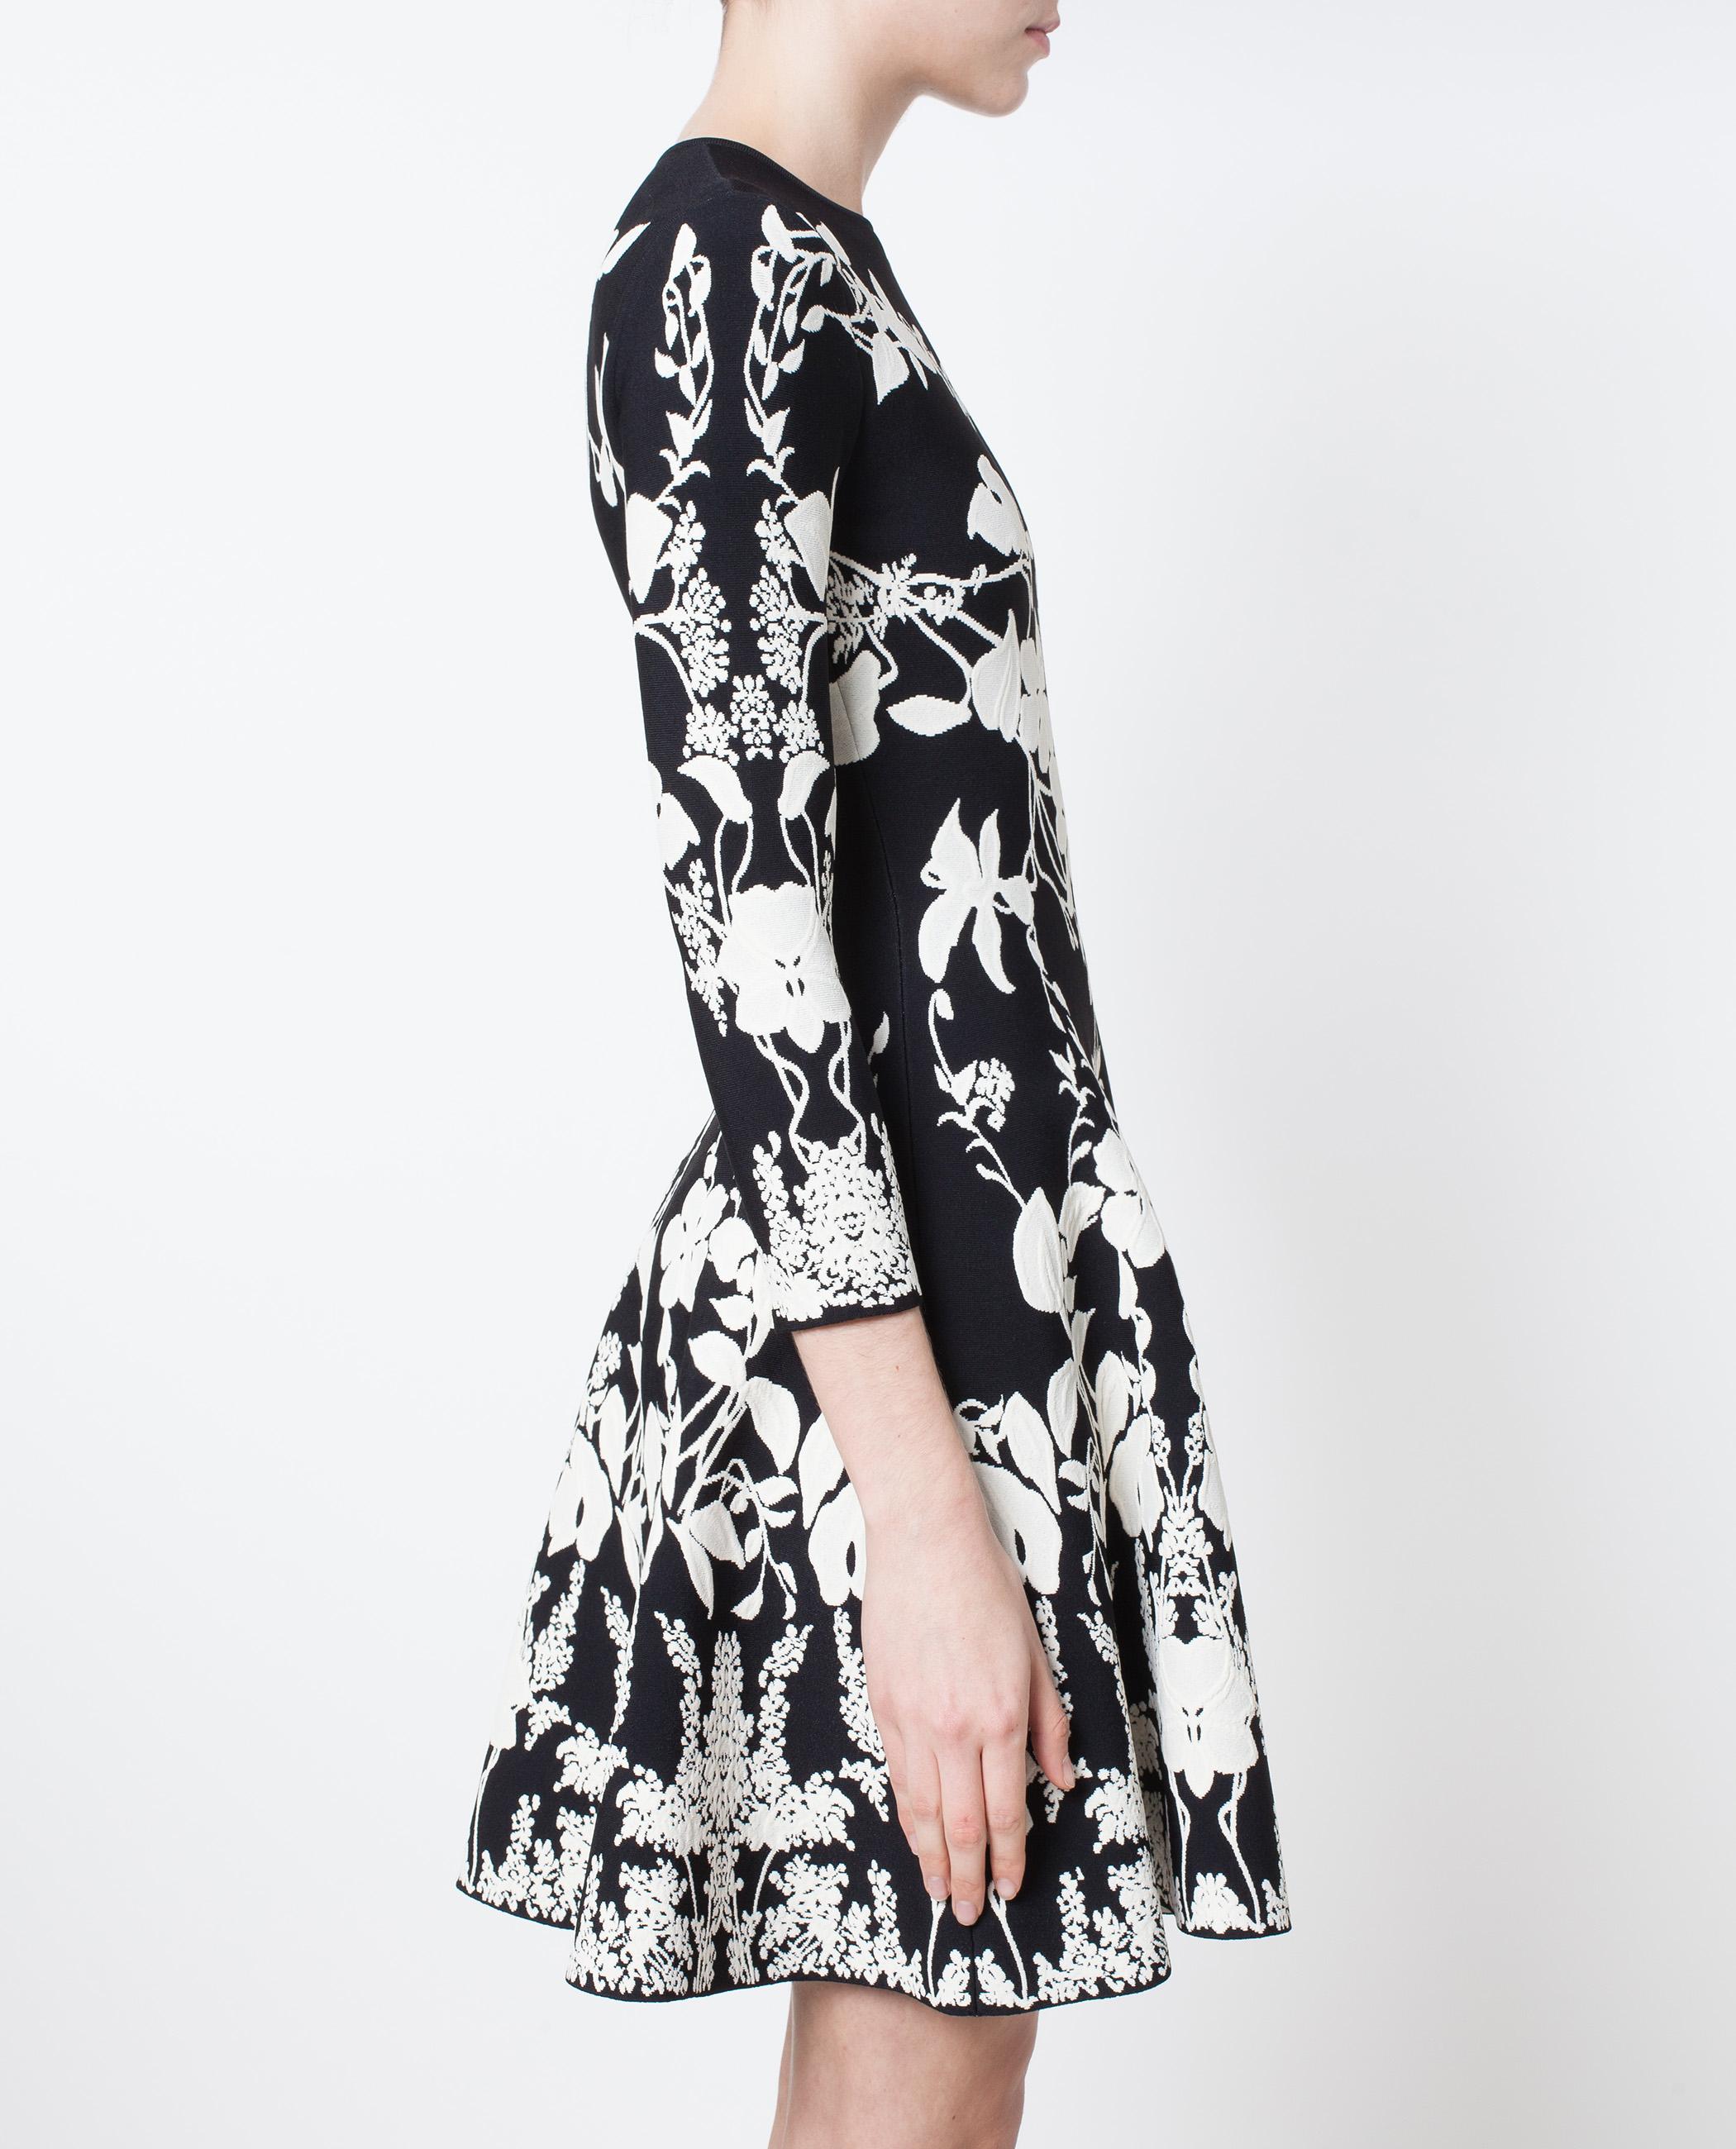 Alexander Mcqueen Floral Patterned Knit Mini Dress In